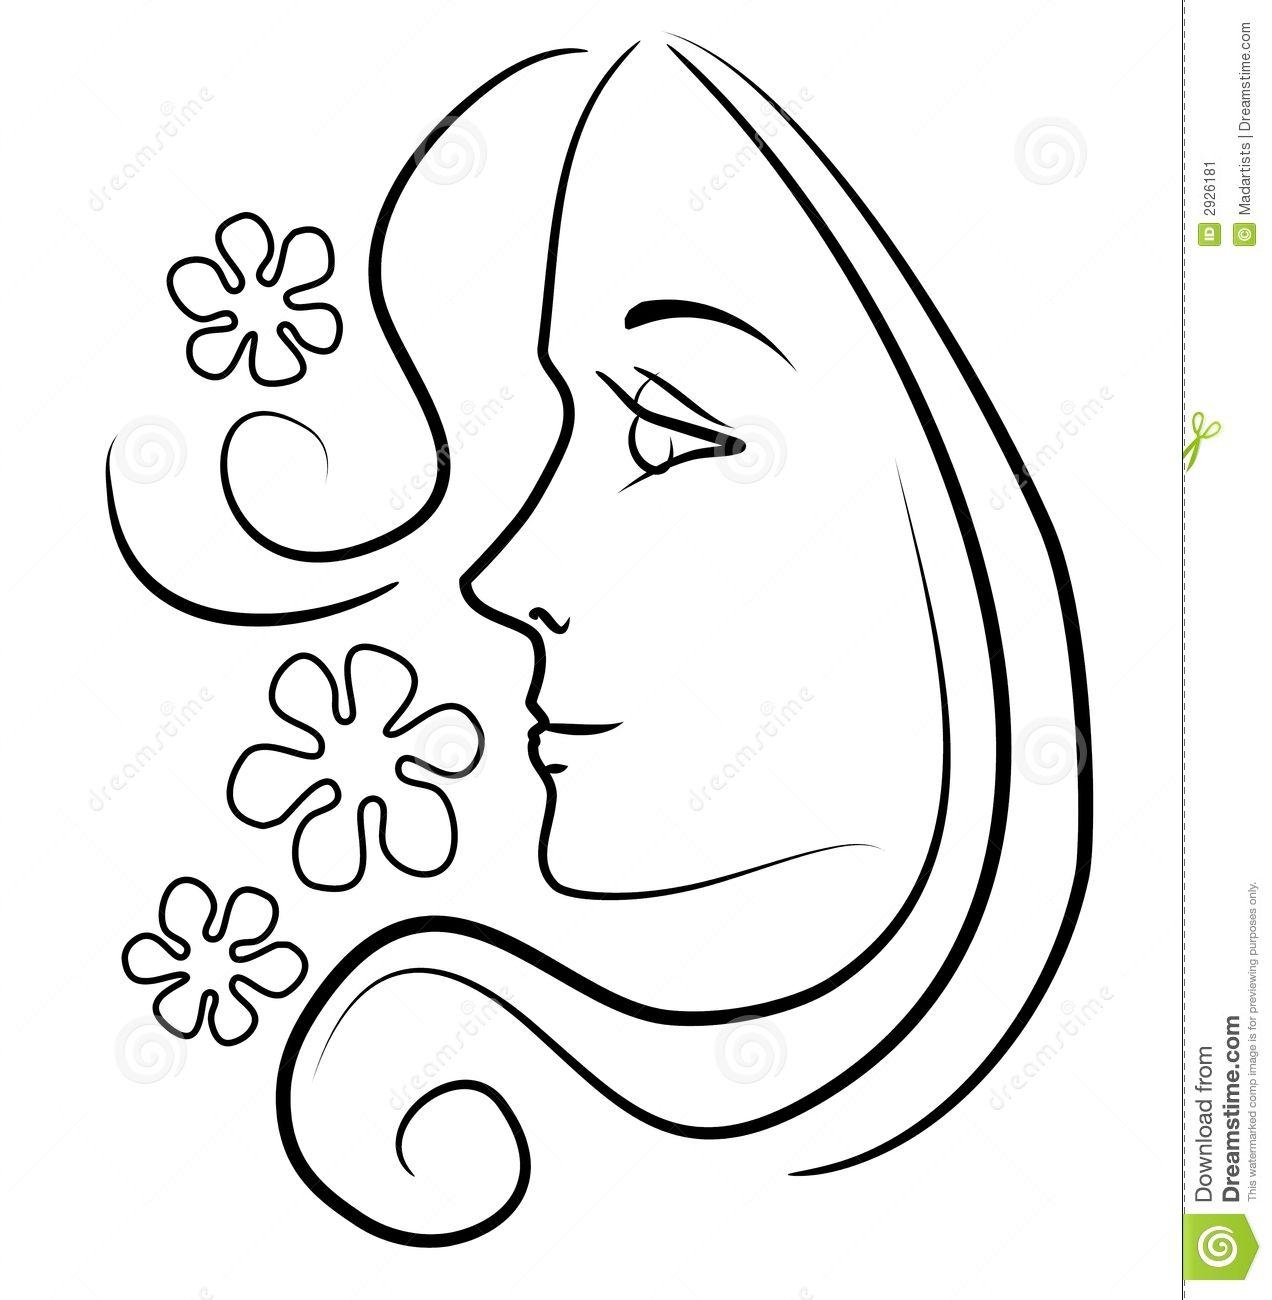 Clip art of a. Aunt clipart girl face